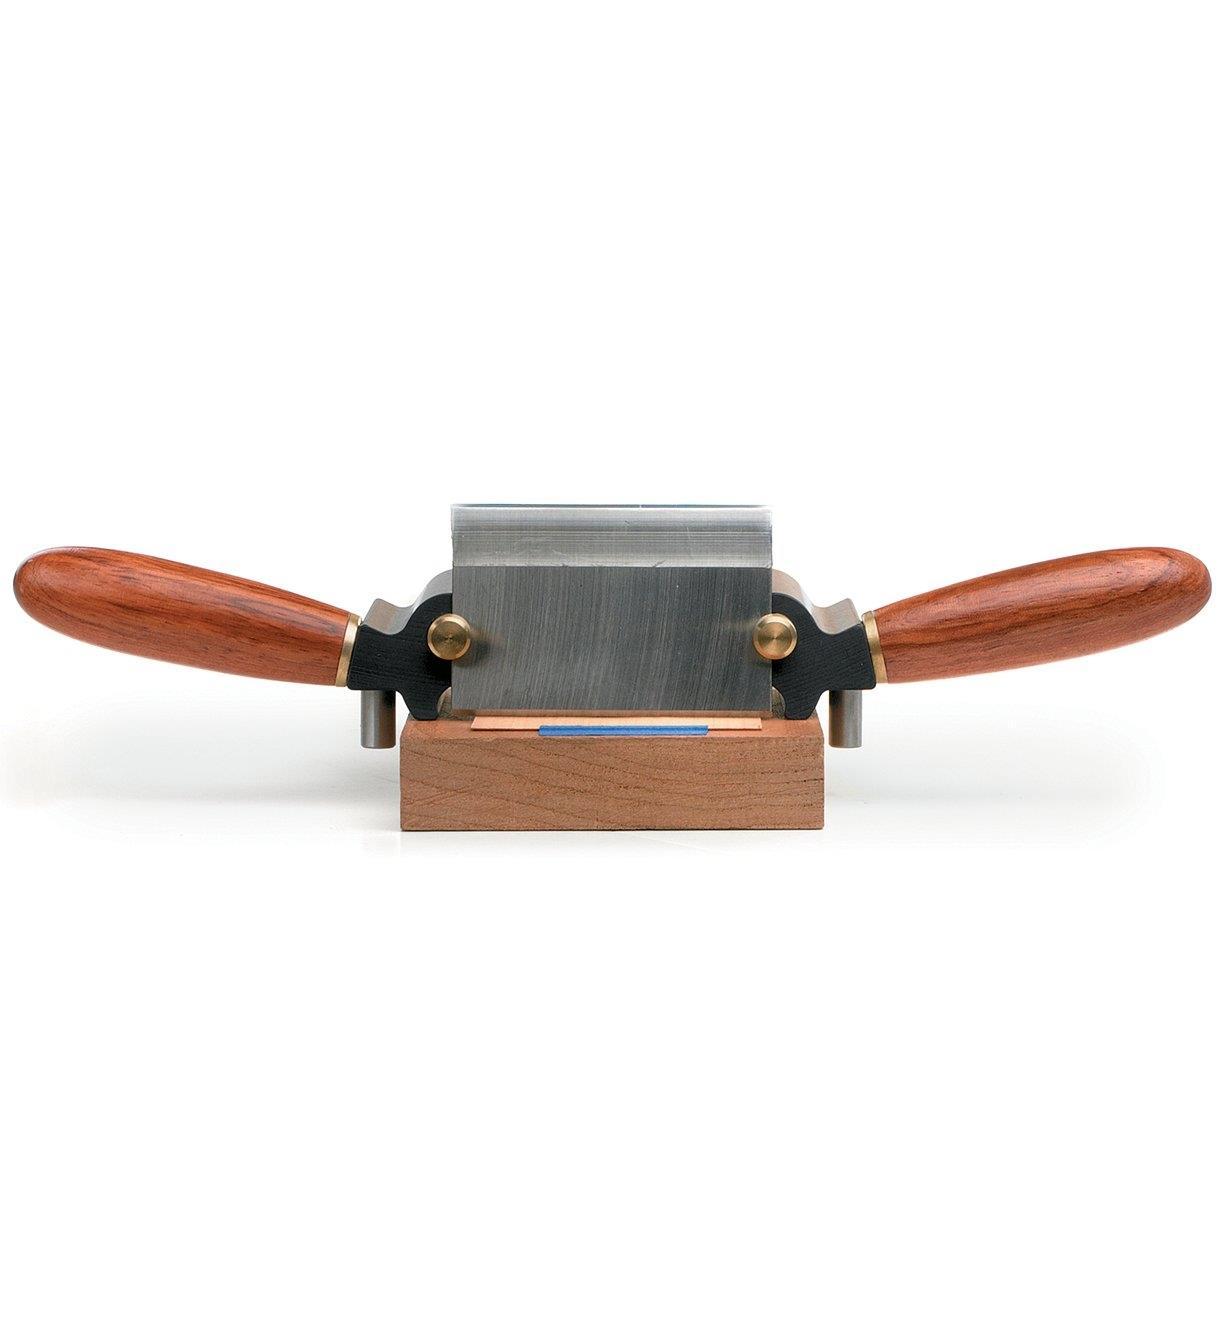 05P3210 - Veritas String Inlay Scraper